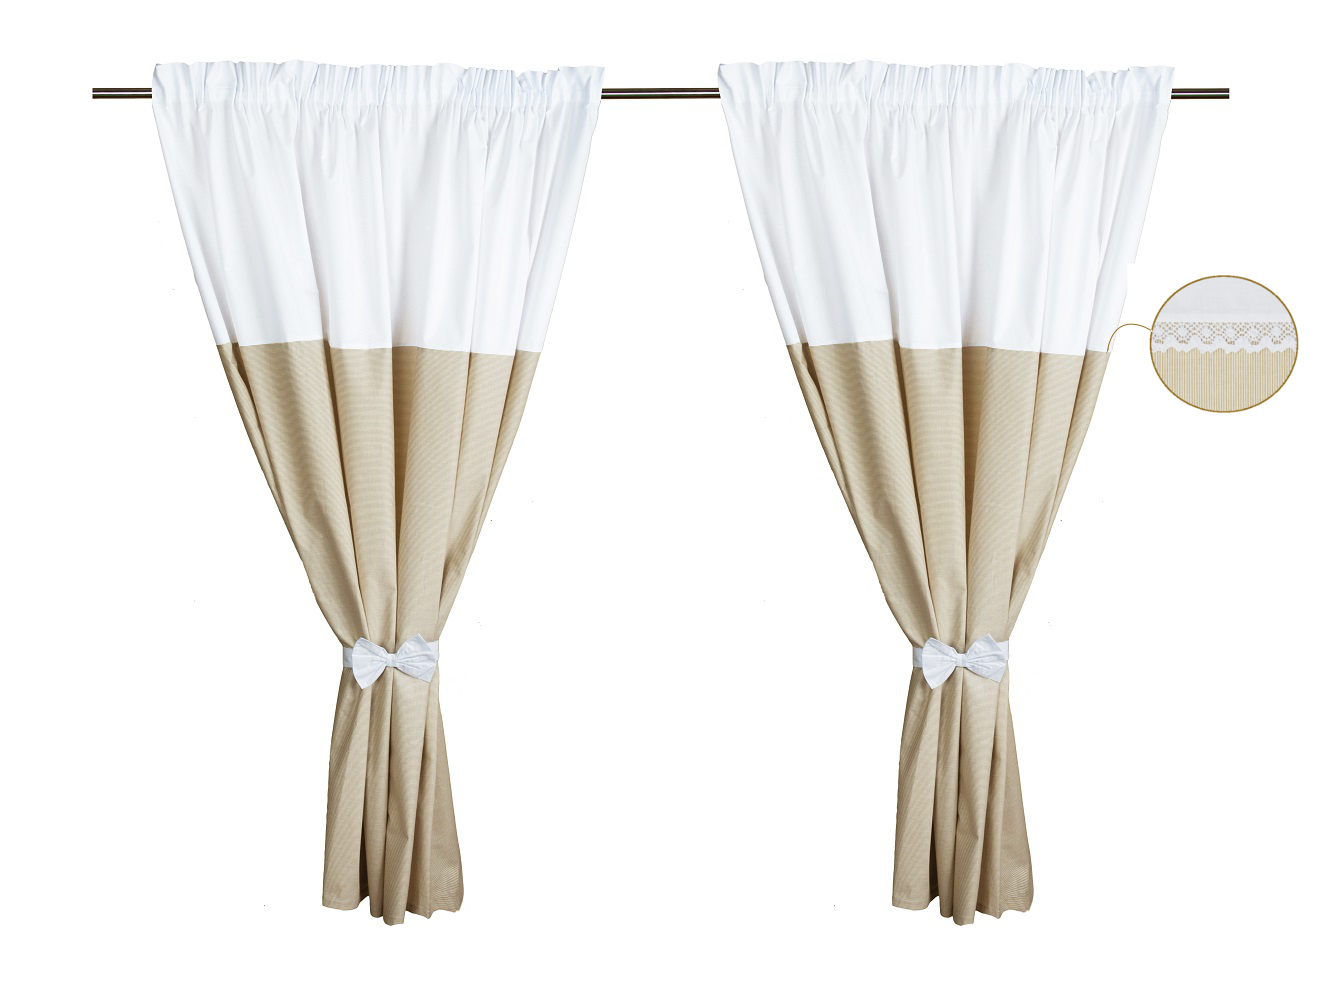 cortinas de habitacin de beb pack de coleccin bordado lneas beige vizaro